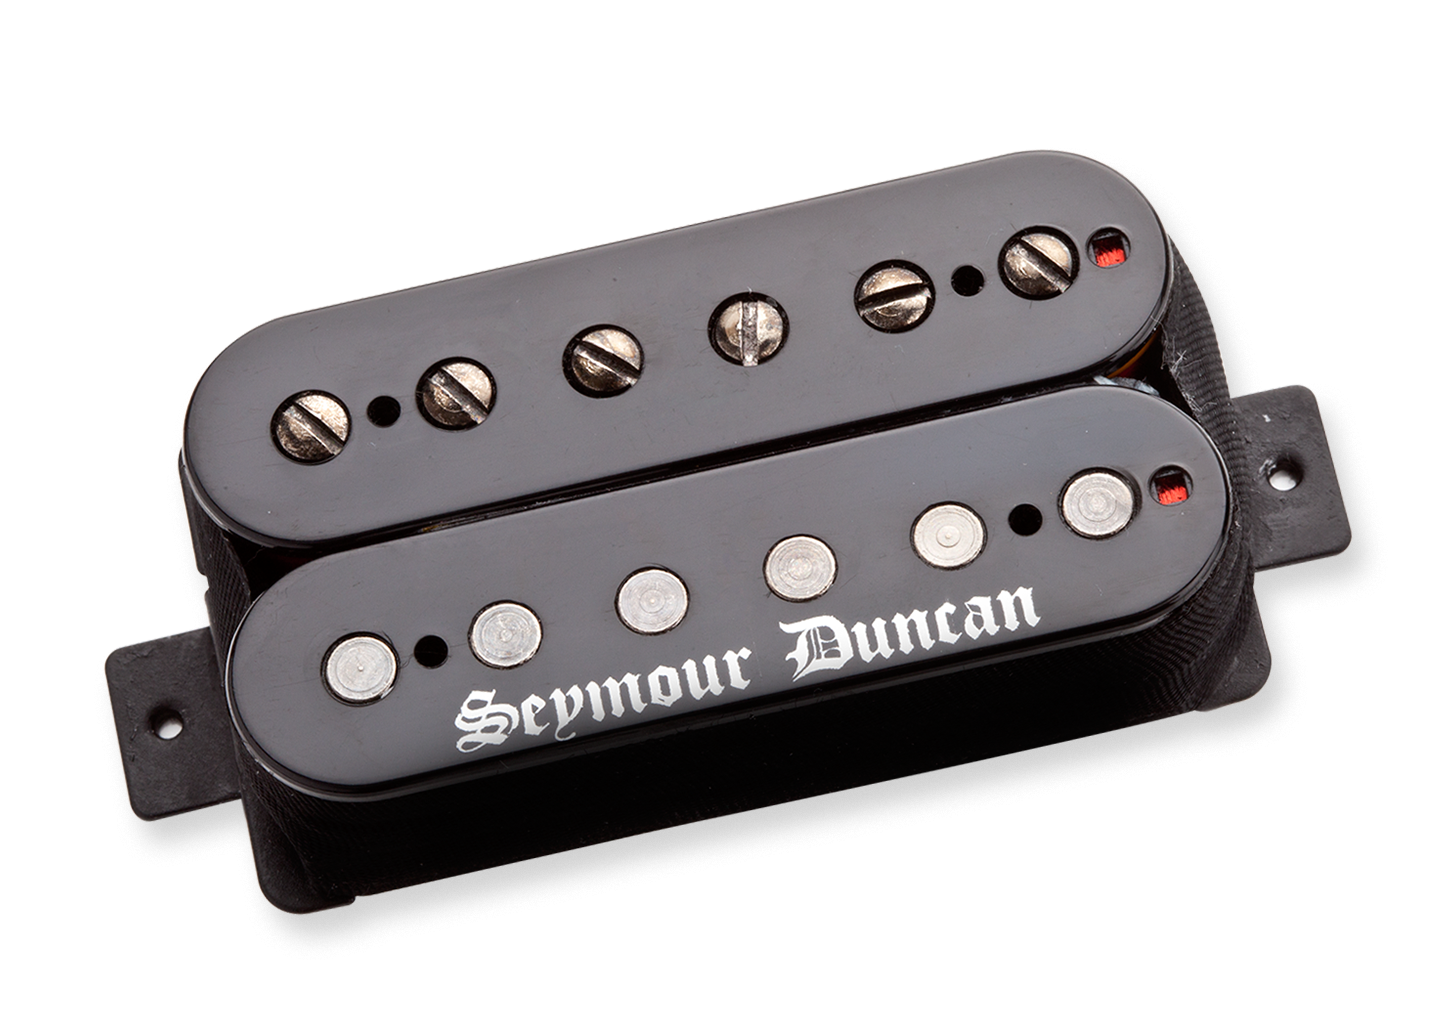 Seymour Duncan Black Winter Humbucker - Neck